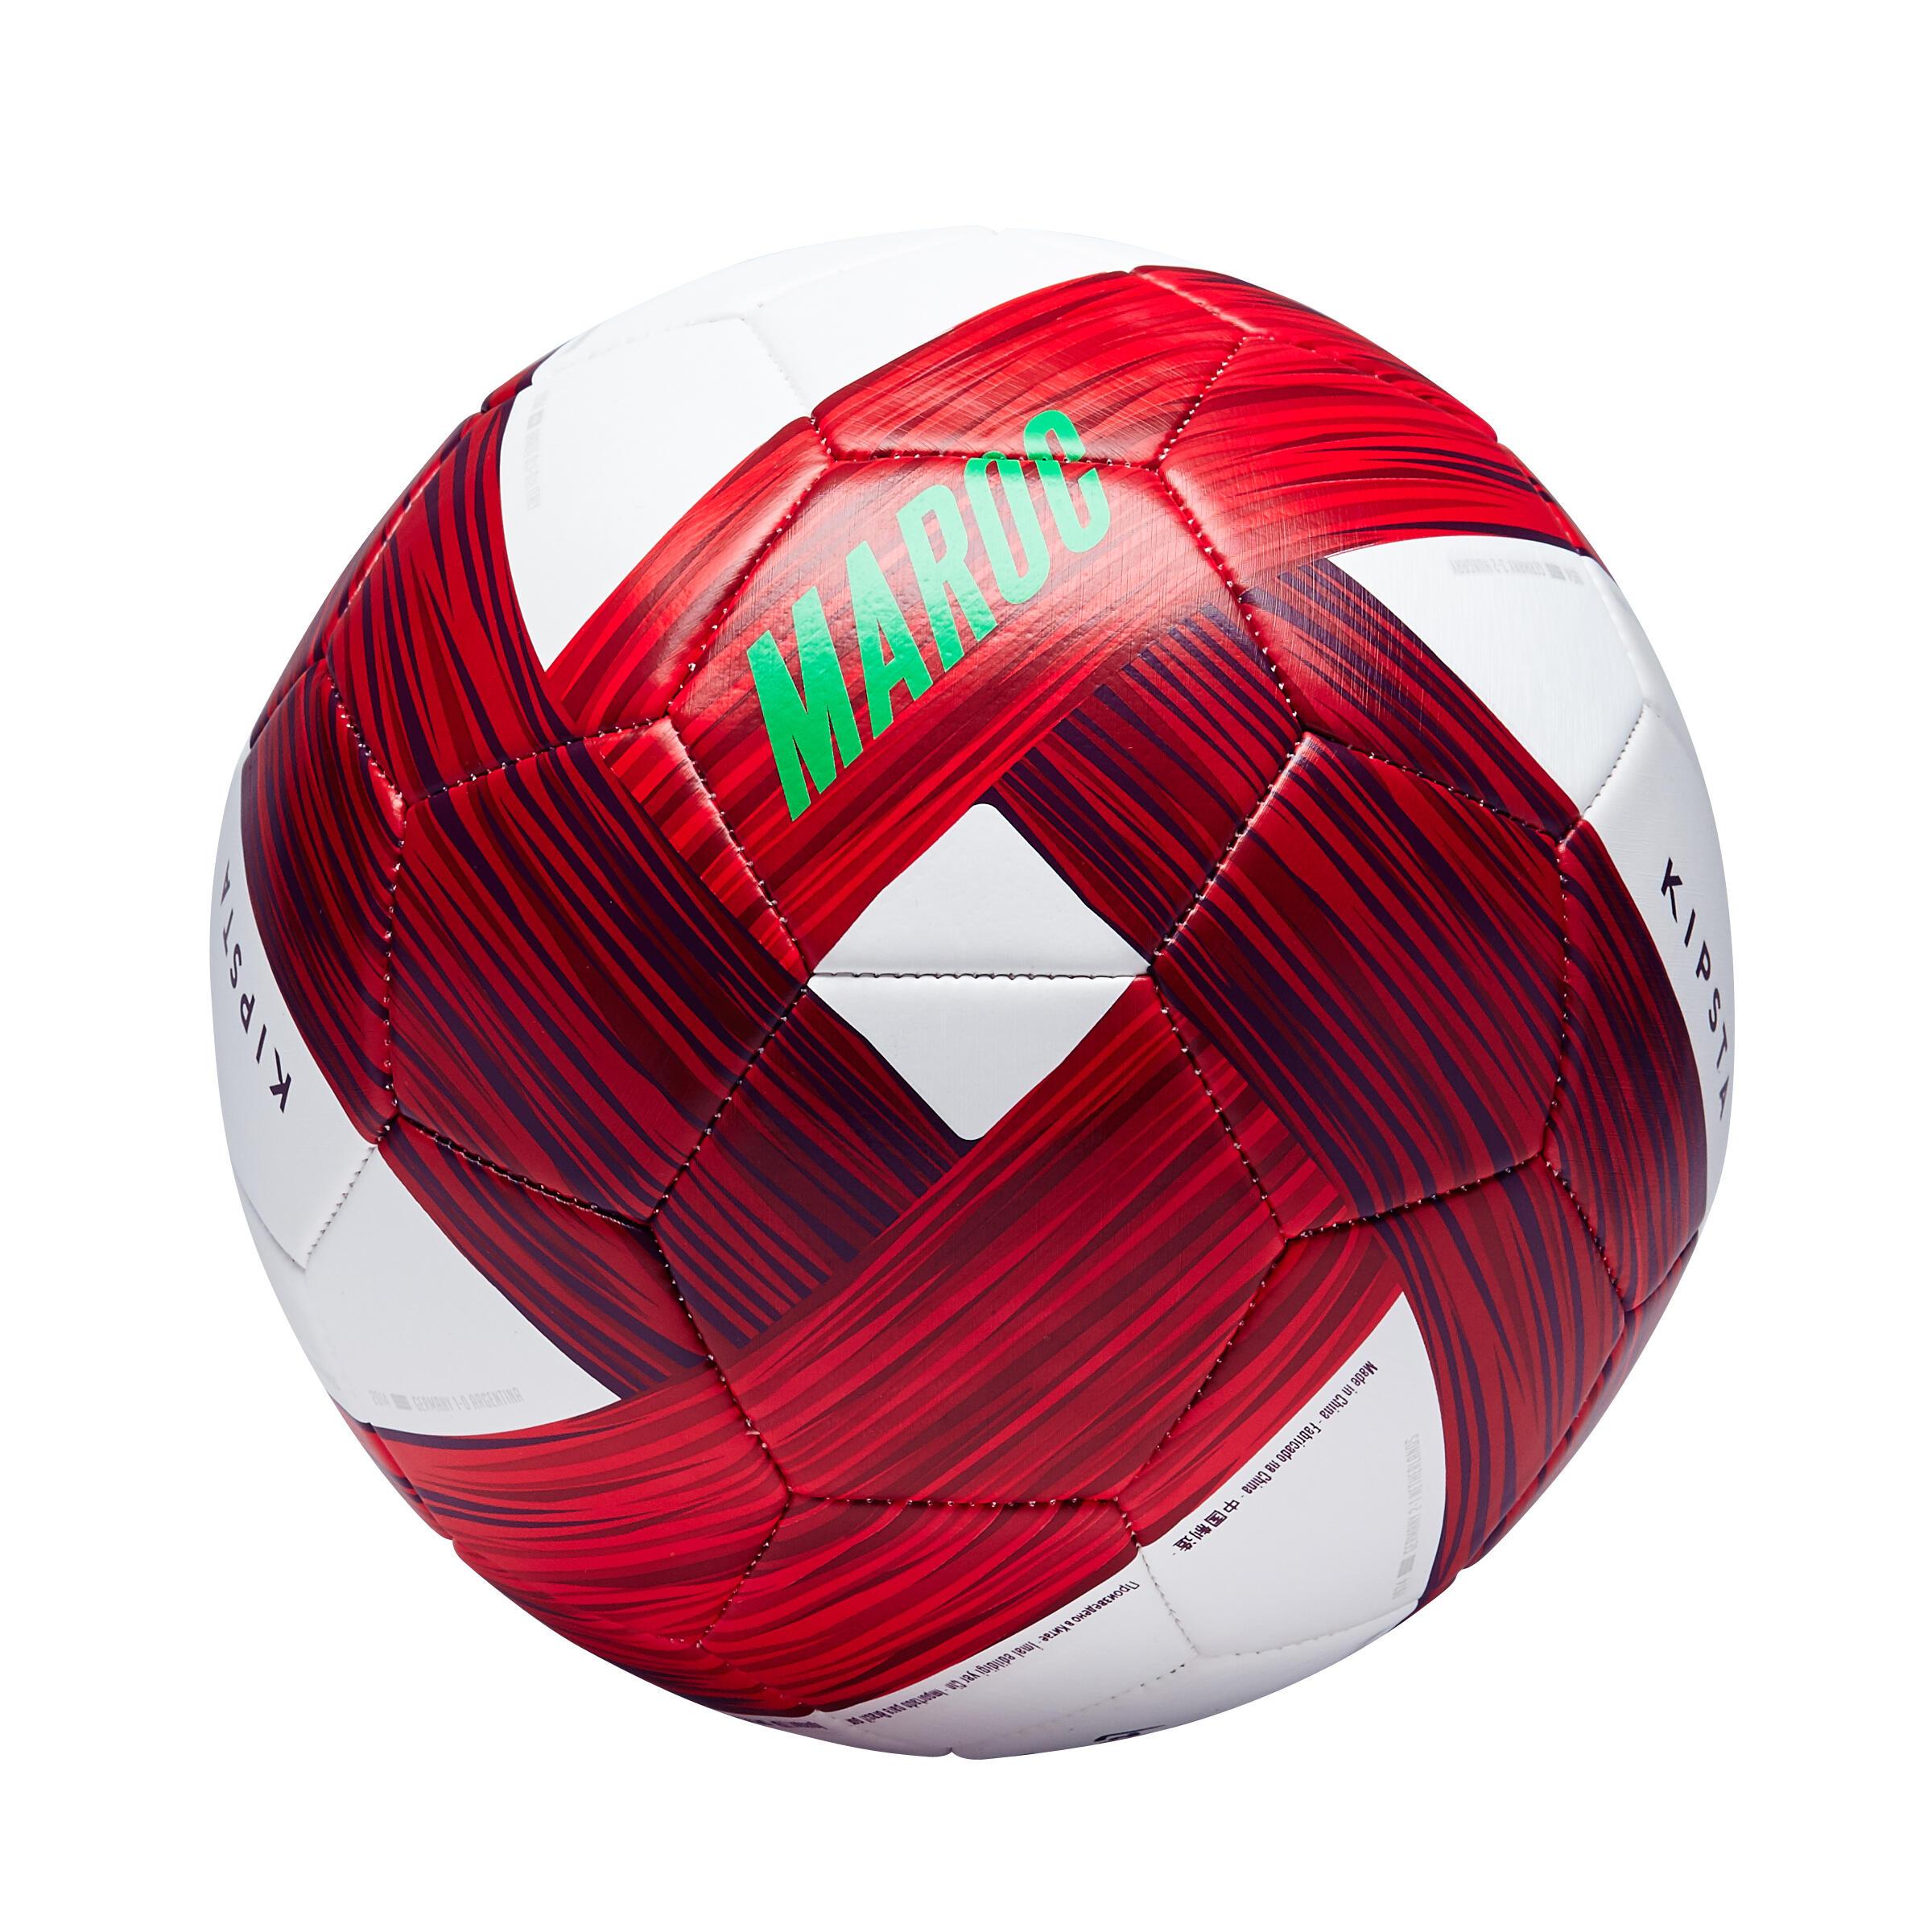 5301d42fc71 Kipsta Voetbal Marokko maat 5 | Decathlon.nl